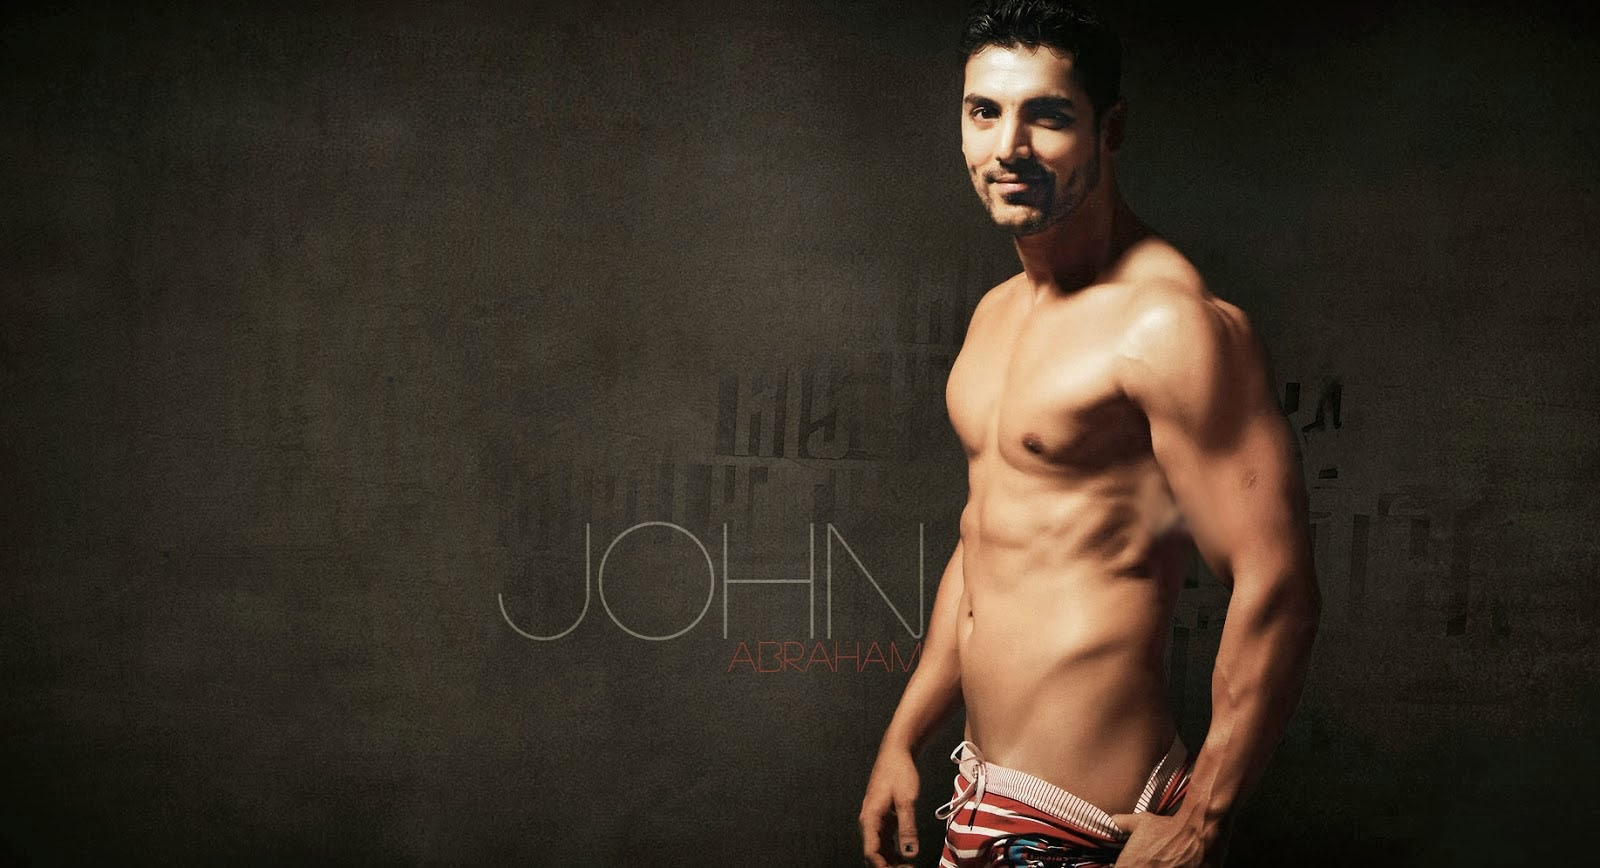 John Abraham Actor Body John abraham hd wallpapers